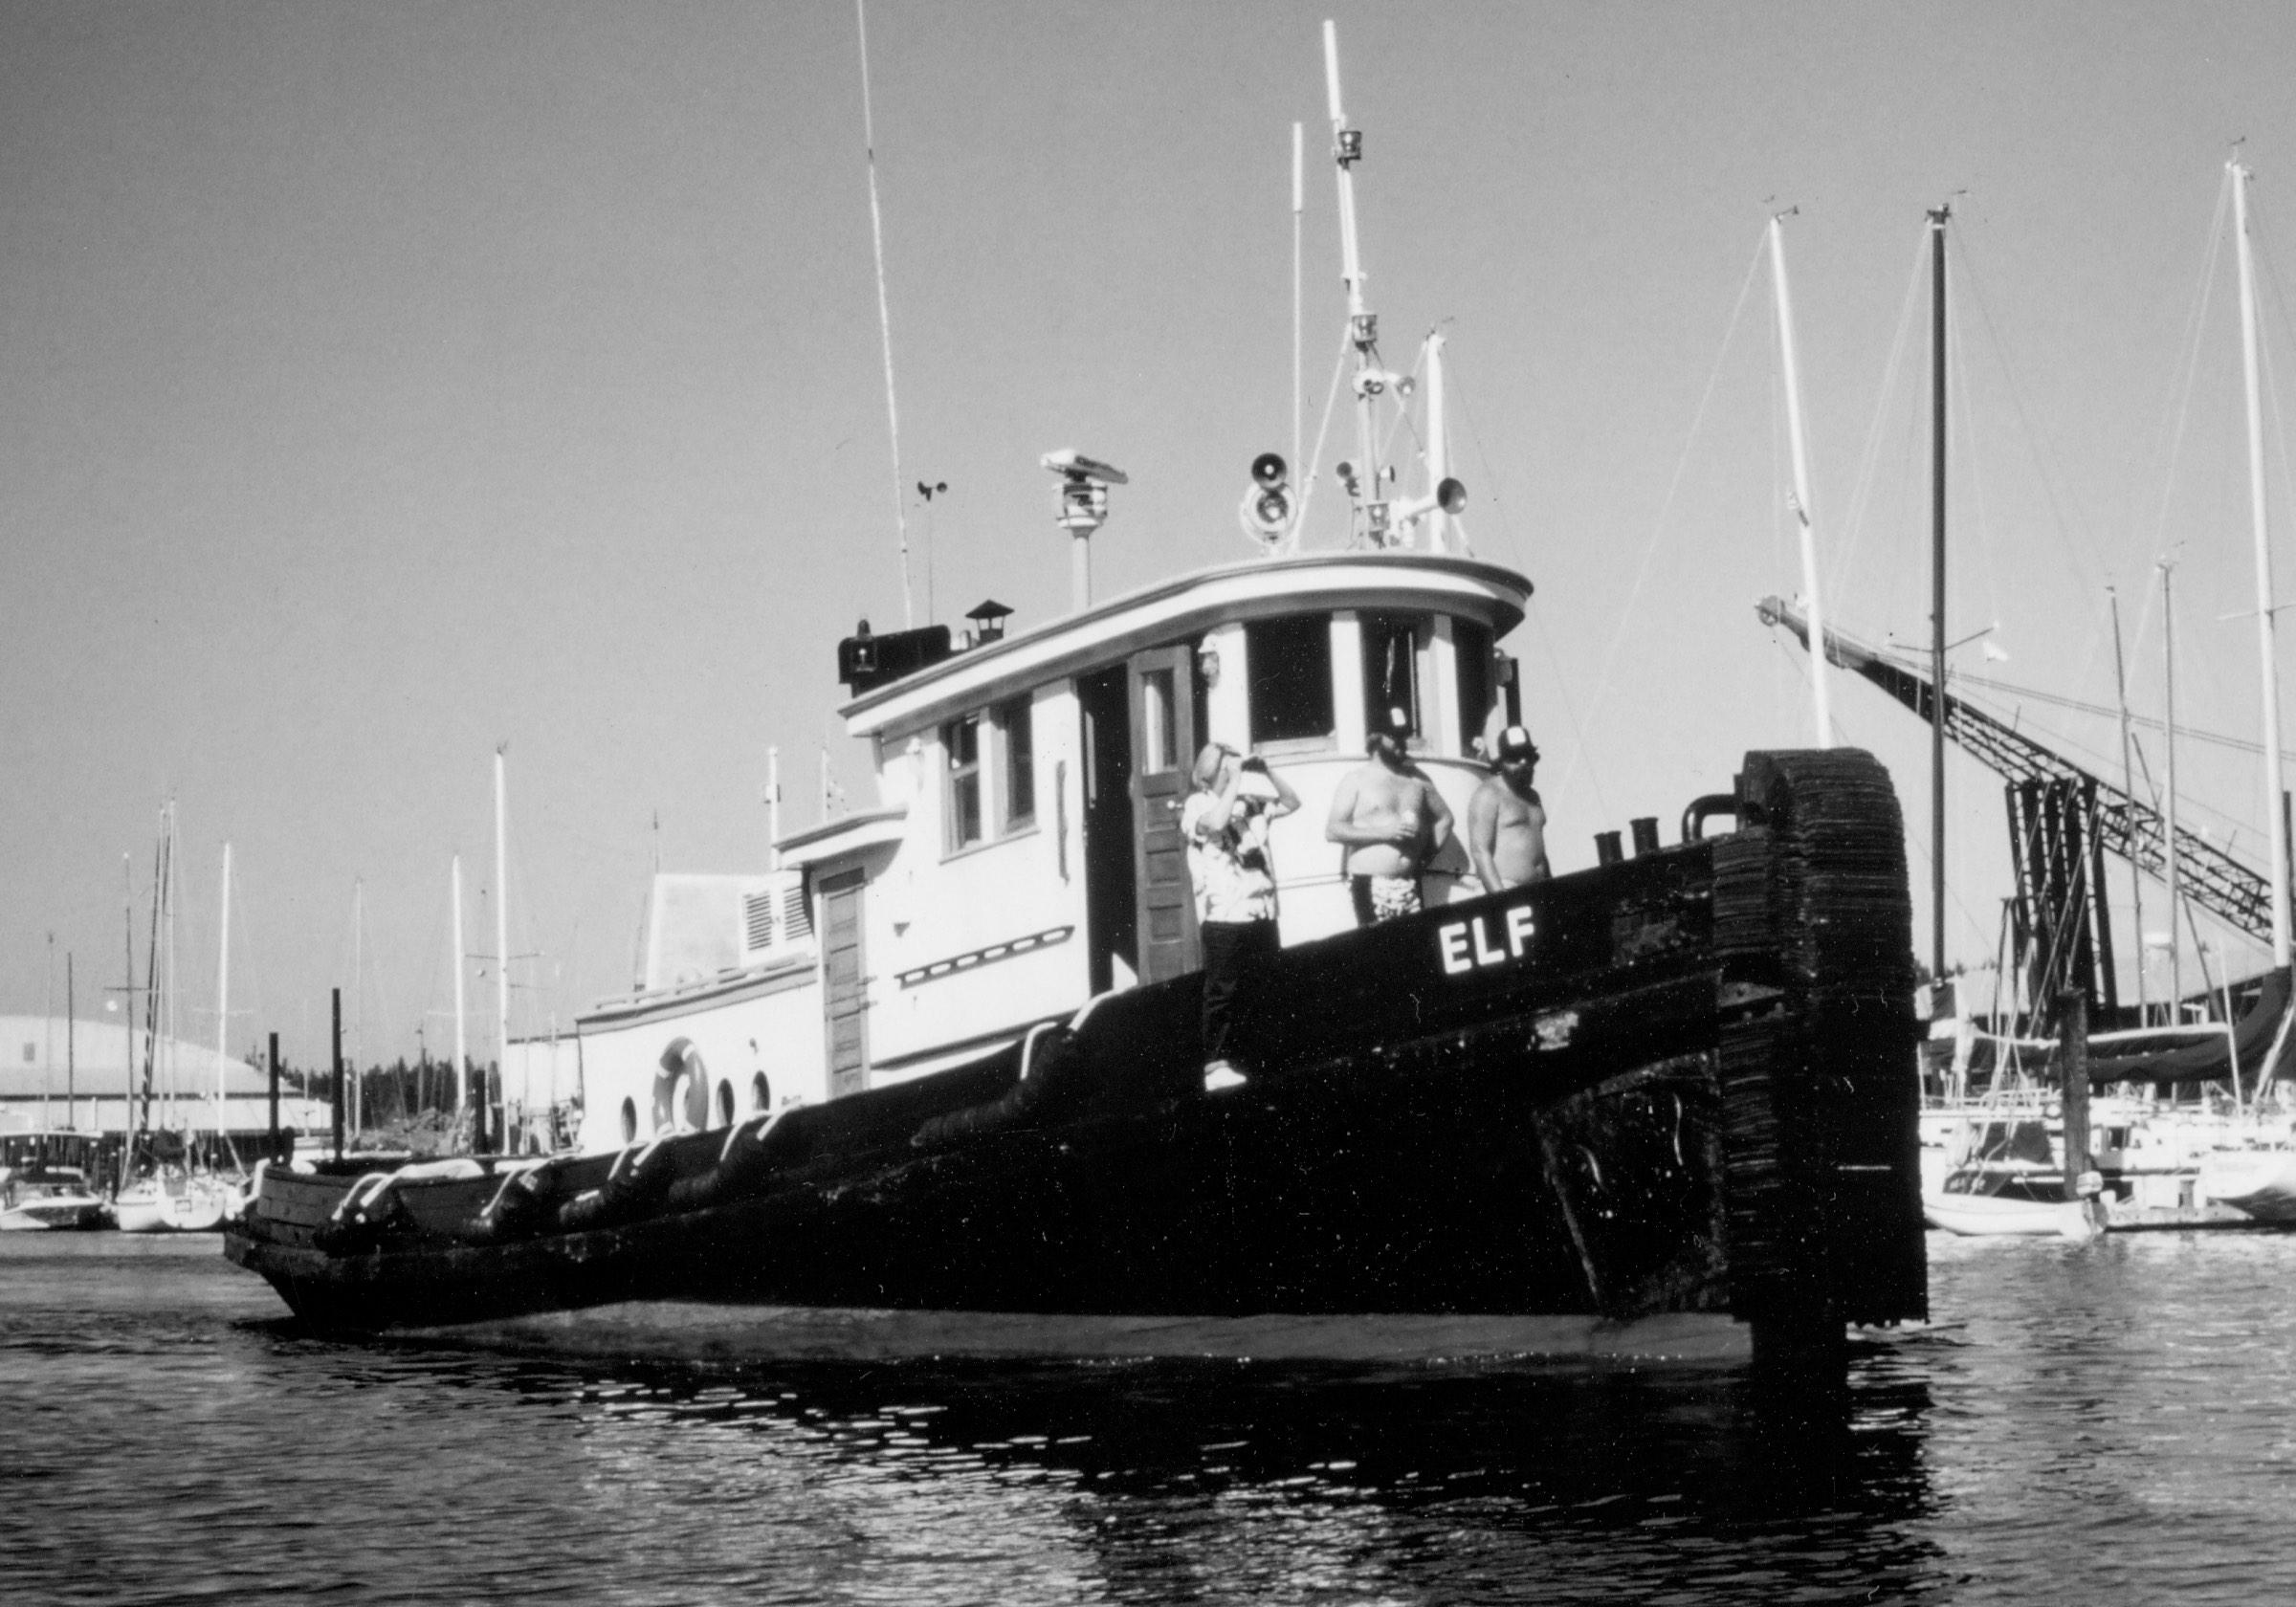 Tug Elf, Olympia Harbor Days 1988, Photo Courtesy Karla Fowler